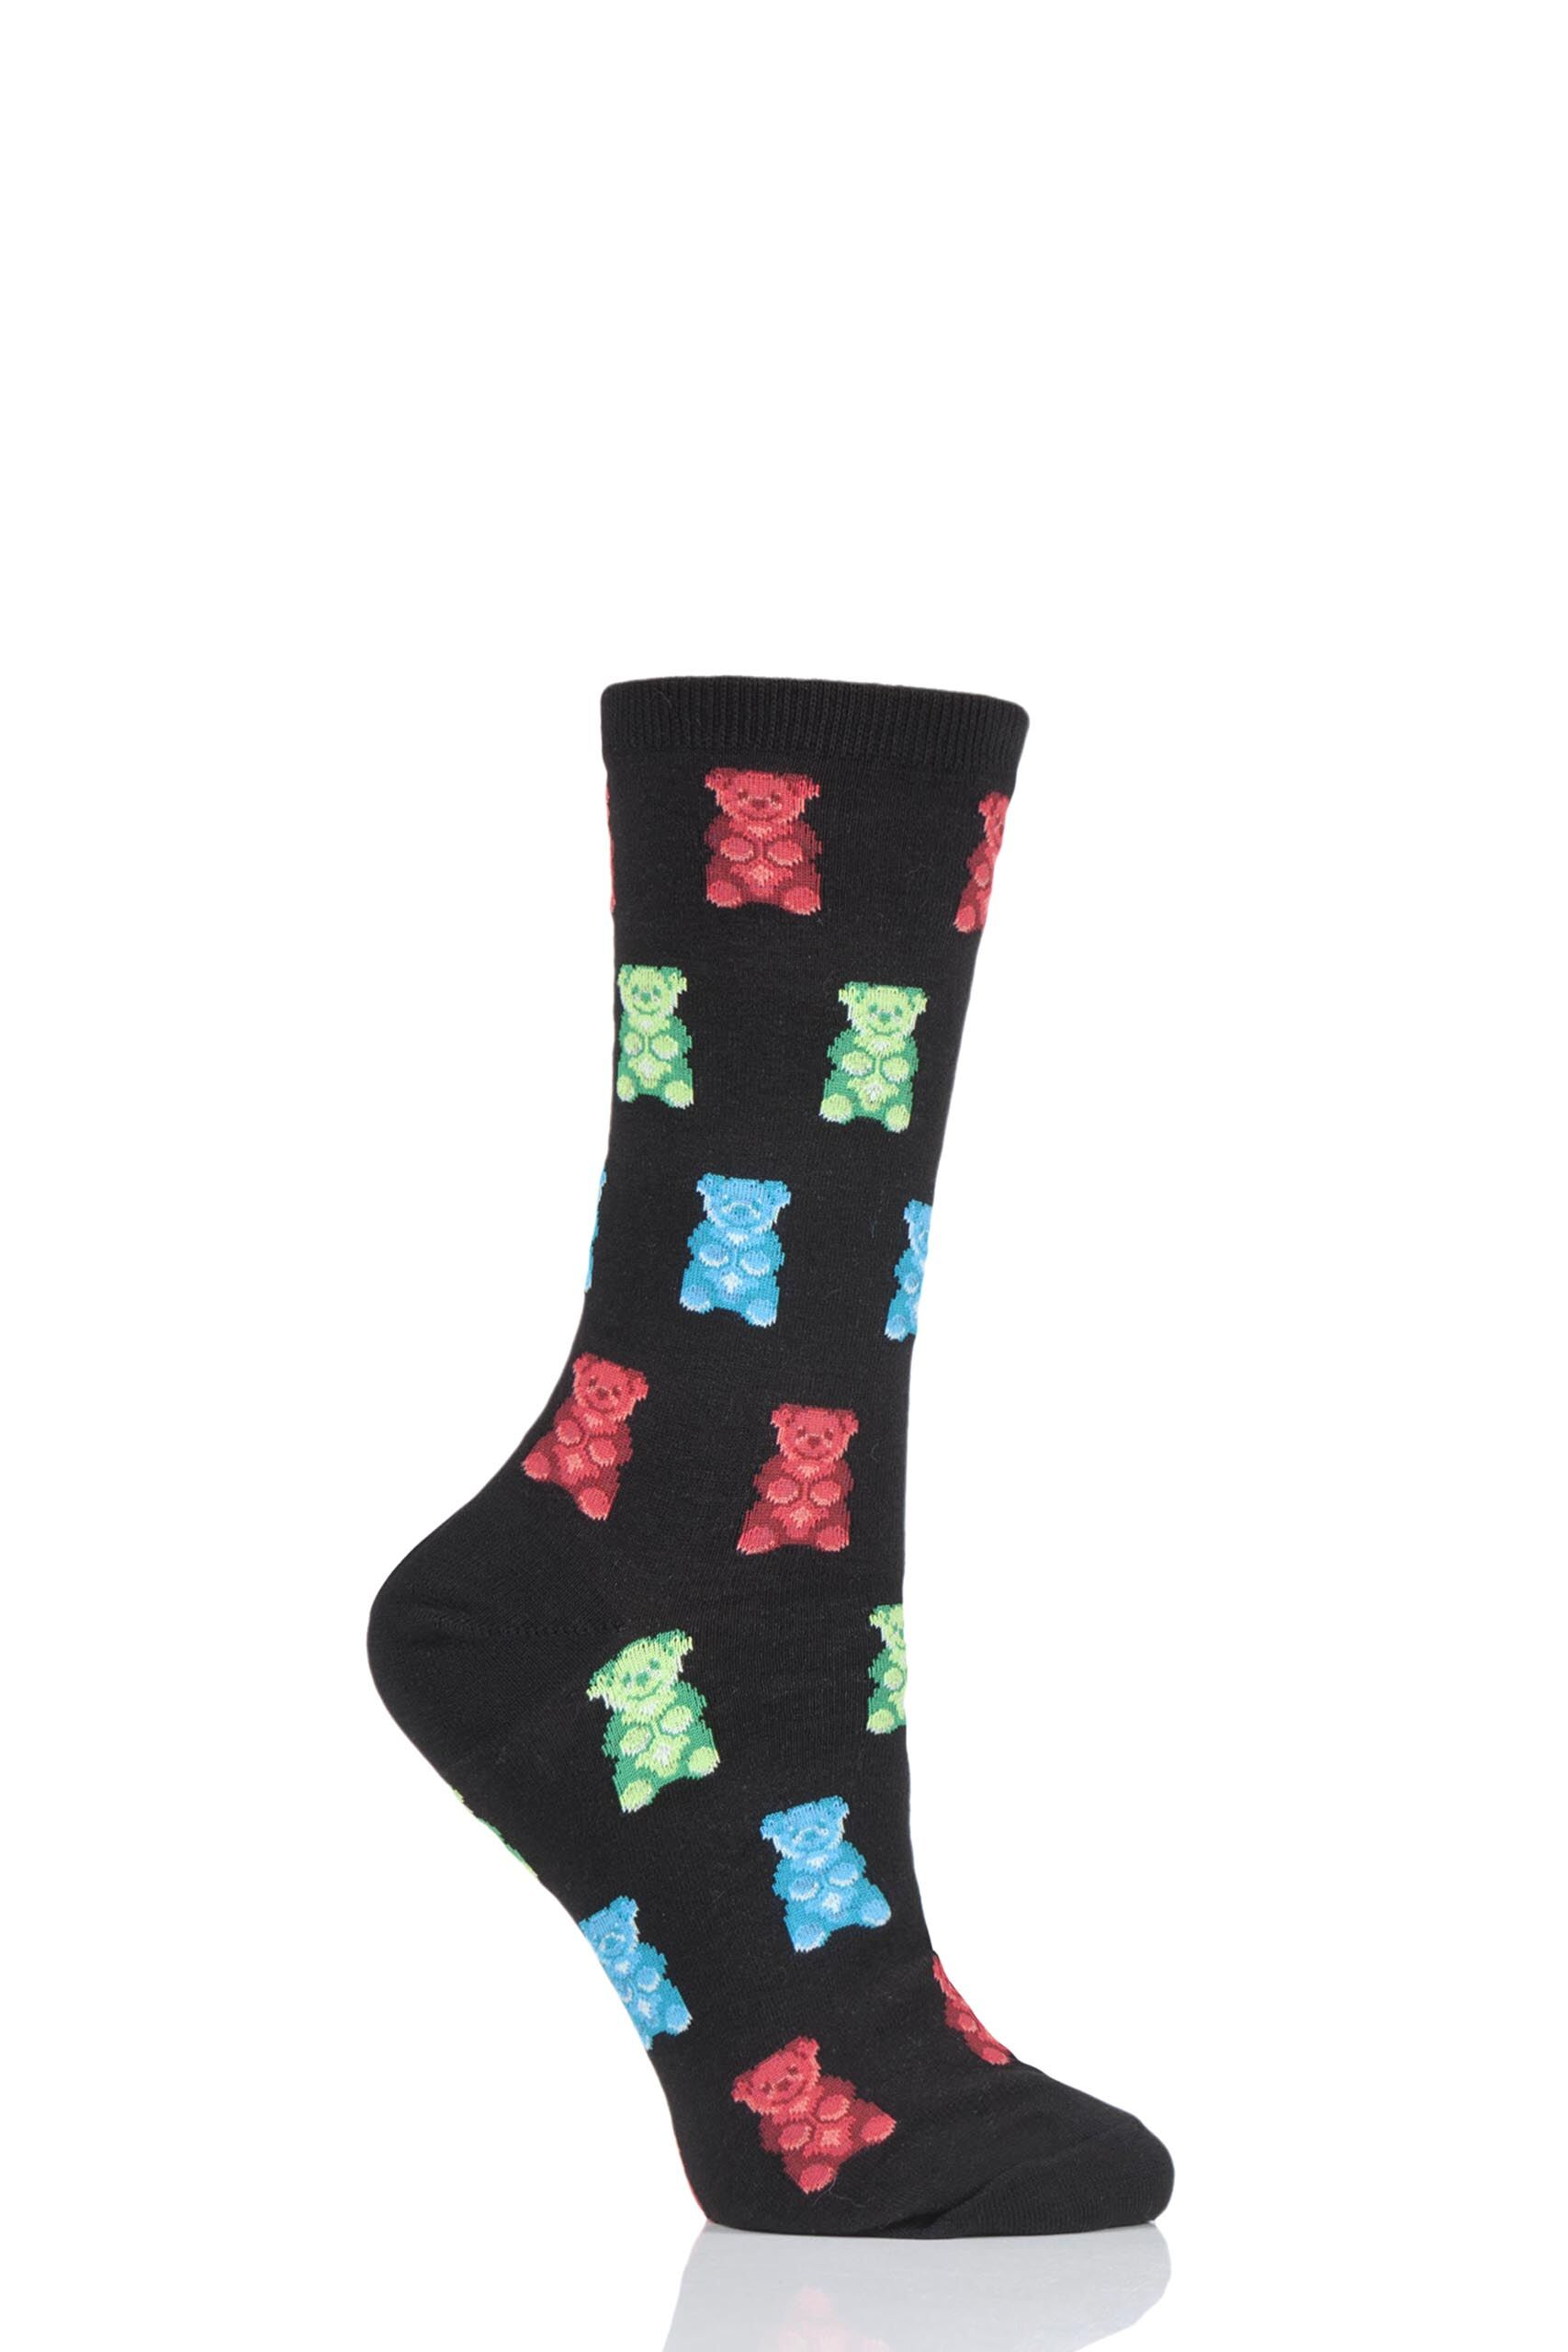 Image of 1 Pair Black HotSox All Over Gummy Bears Cotton Socks Ladies 4-9 Ladies - Hot Sox